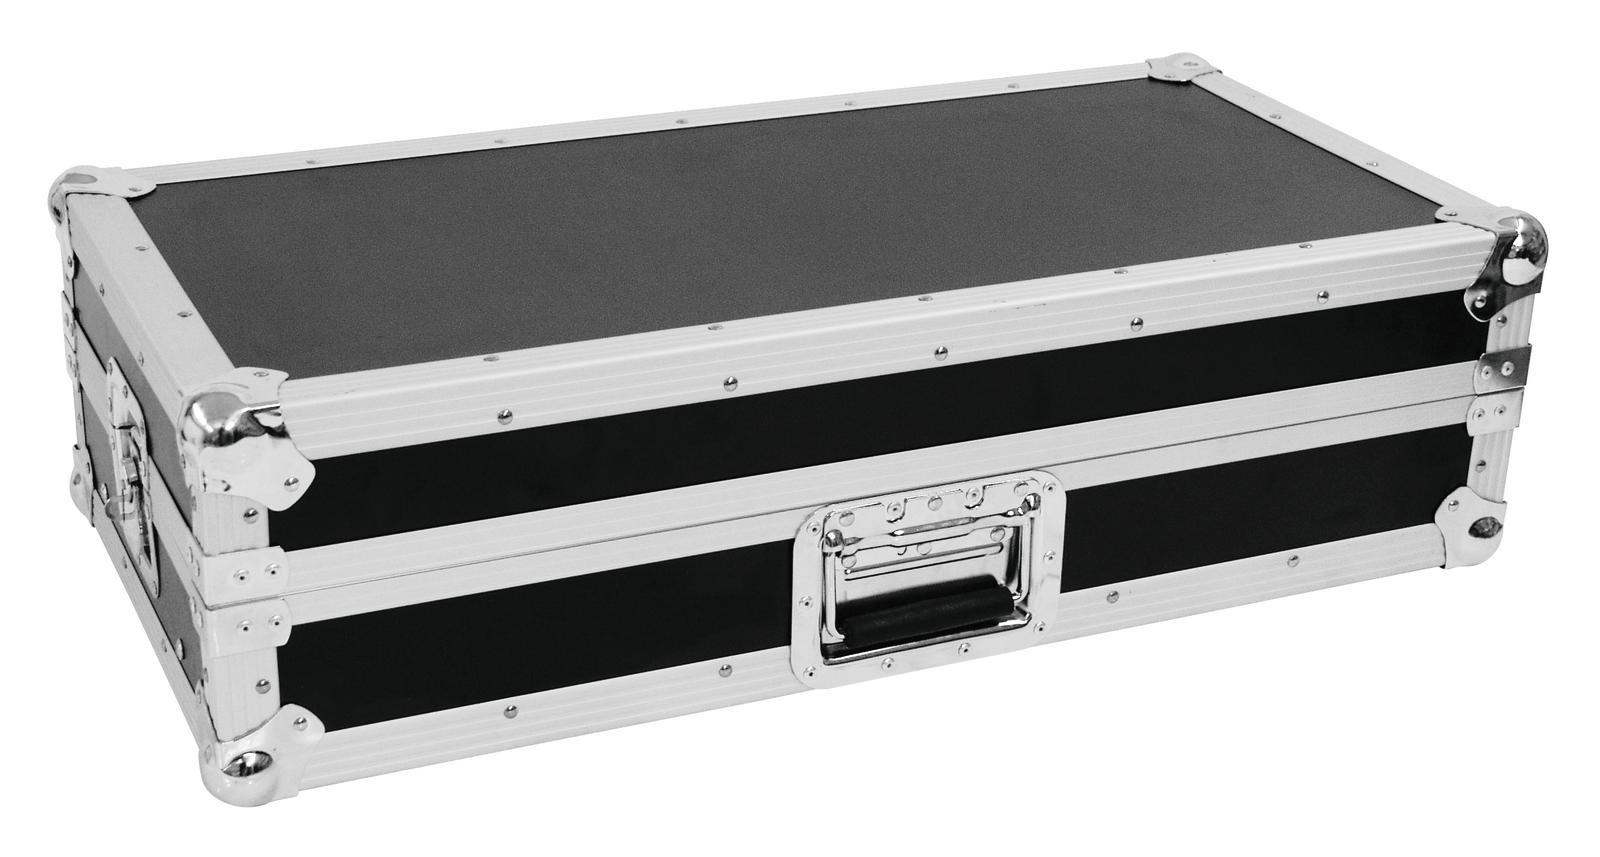 ROADINGER Mixer-Case Profi MCB-27, schräg, sw, 7HE